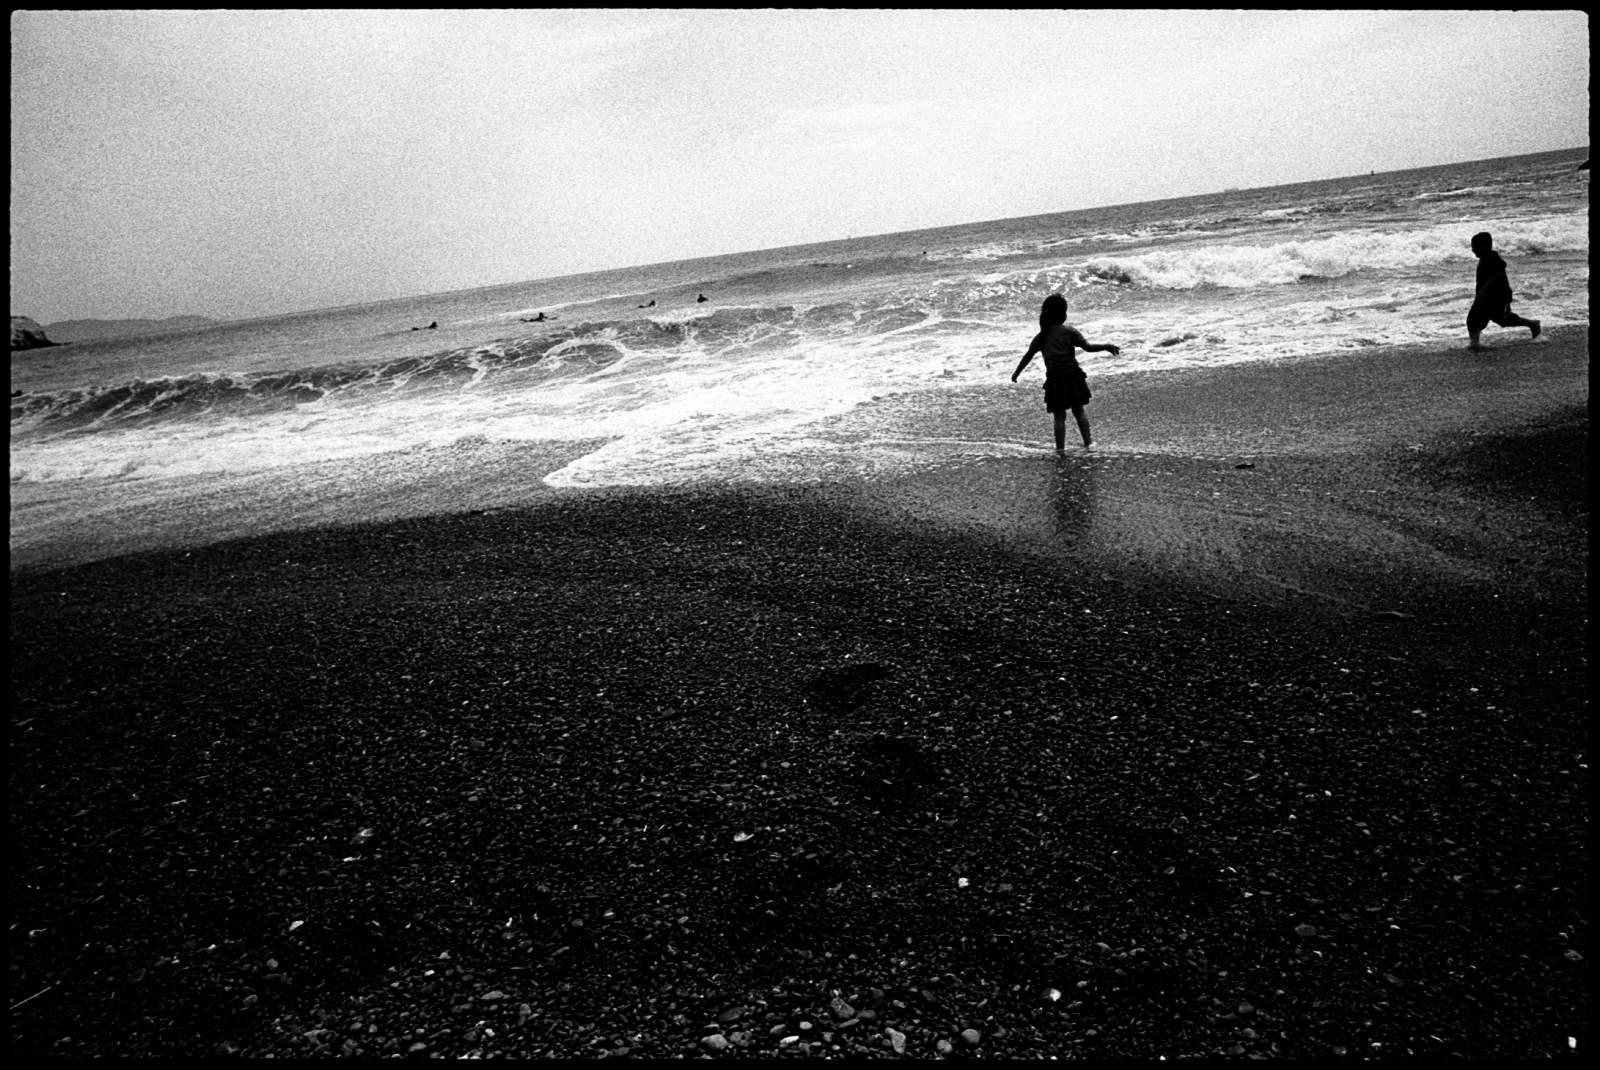 No. 0369_07 - Rodeo Beach, Marin County, CA. July of 2015.